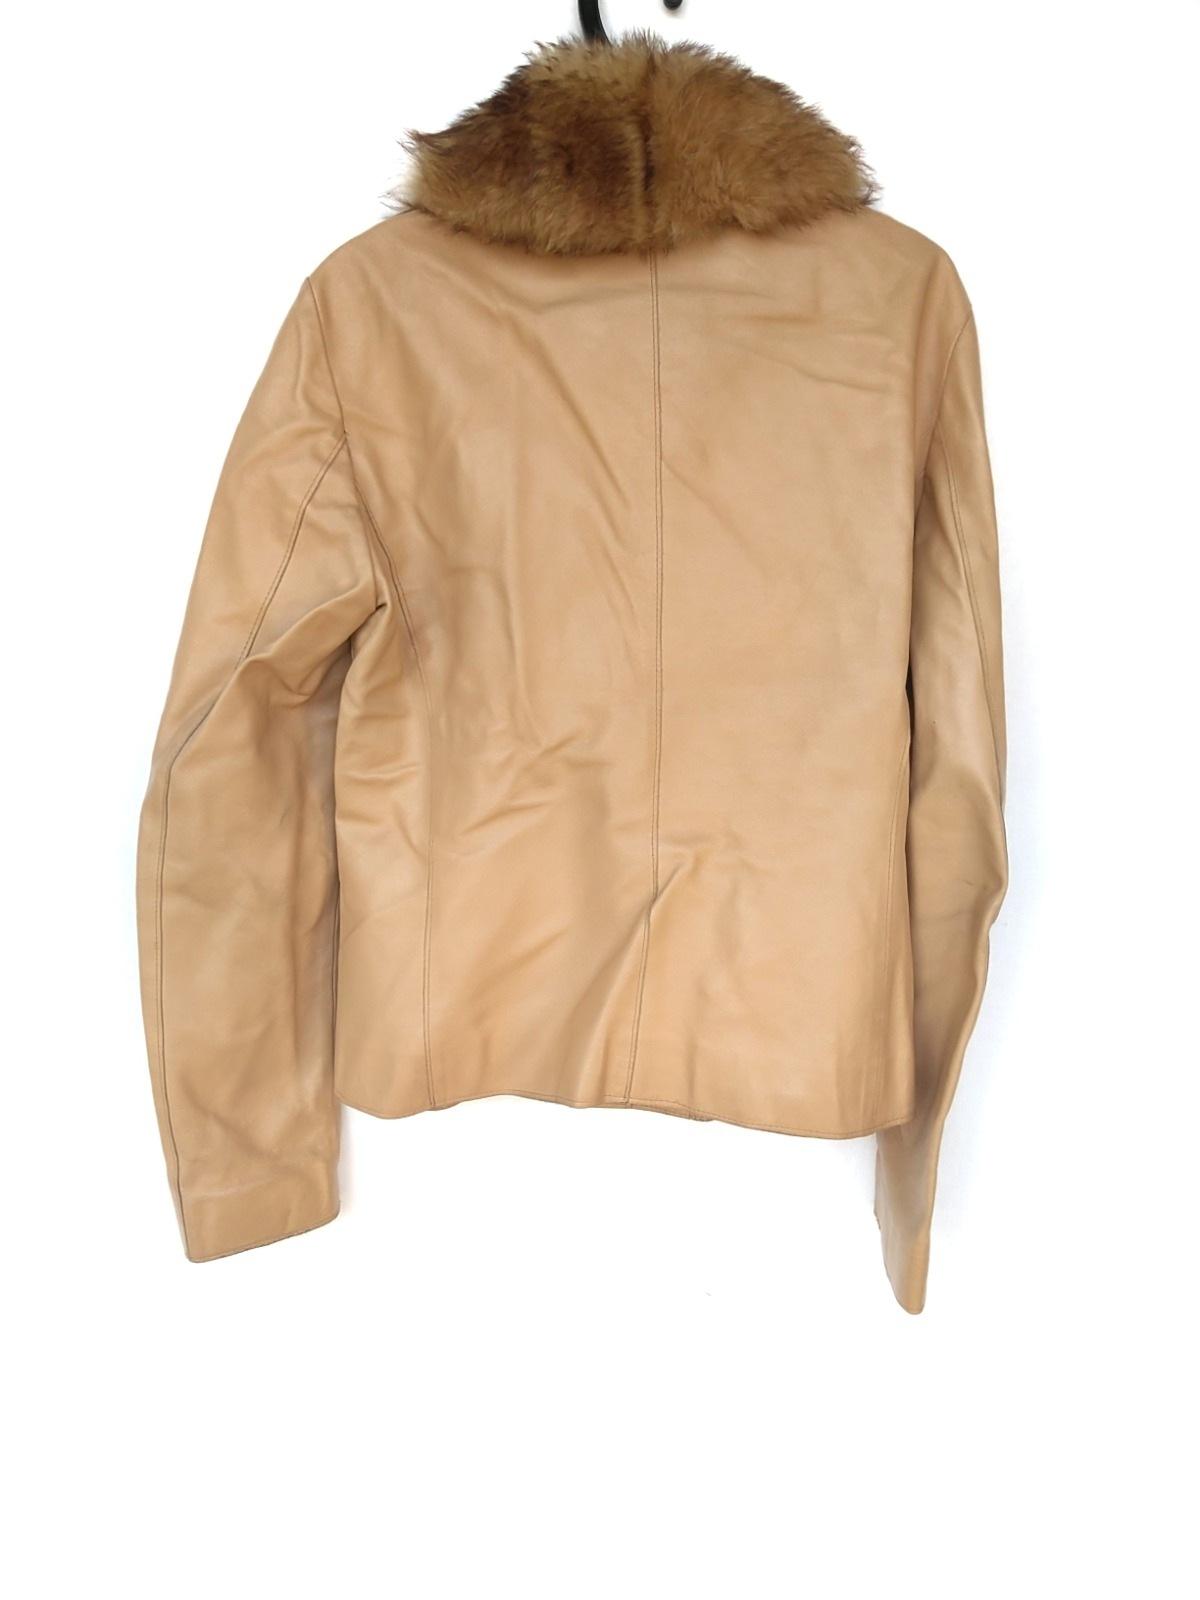 BLAKES(ブレークス)のコート